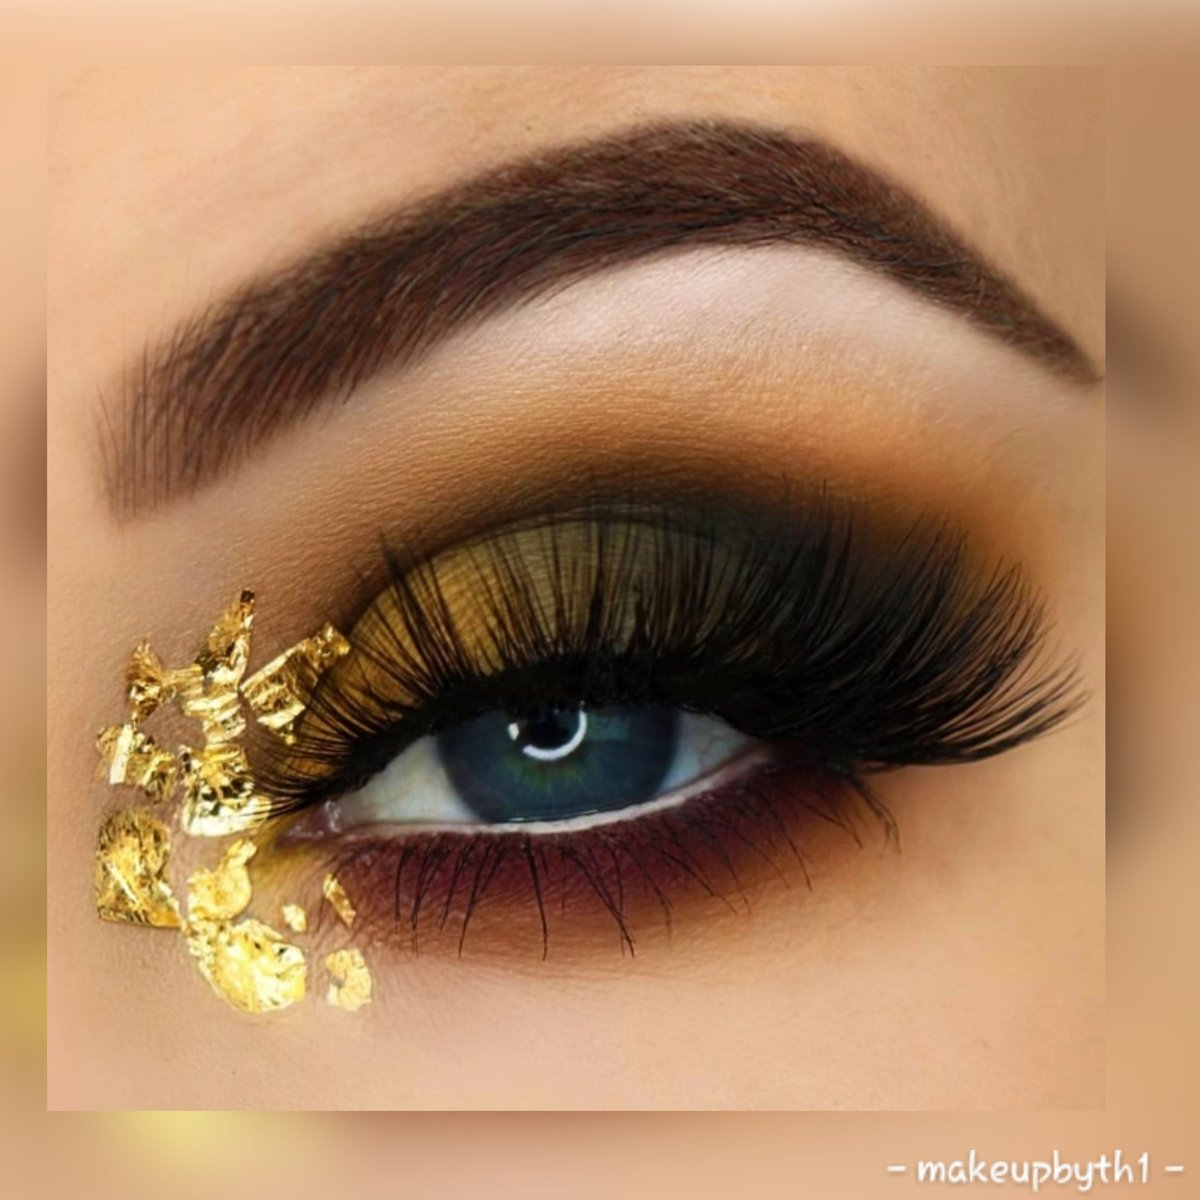 THOSE LASHES 🙊🙊🙊🙊!!!!!! 👏👏👏👏👏👏👏👏👏👏👏👏👏👏 I LOVE THEM..... NEED MORE!!!!!! @SoSueMe_ie #greedlashes  @laurencleare brushes @MACcosmeticsUK #fascinatingeyepencil  All Shadows @inglotireland & @FuschiaEffect  Golden Flakes @amazon https://t.co/ZoAkFOWivv